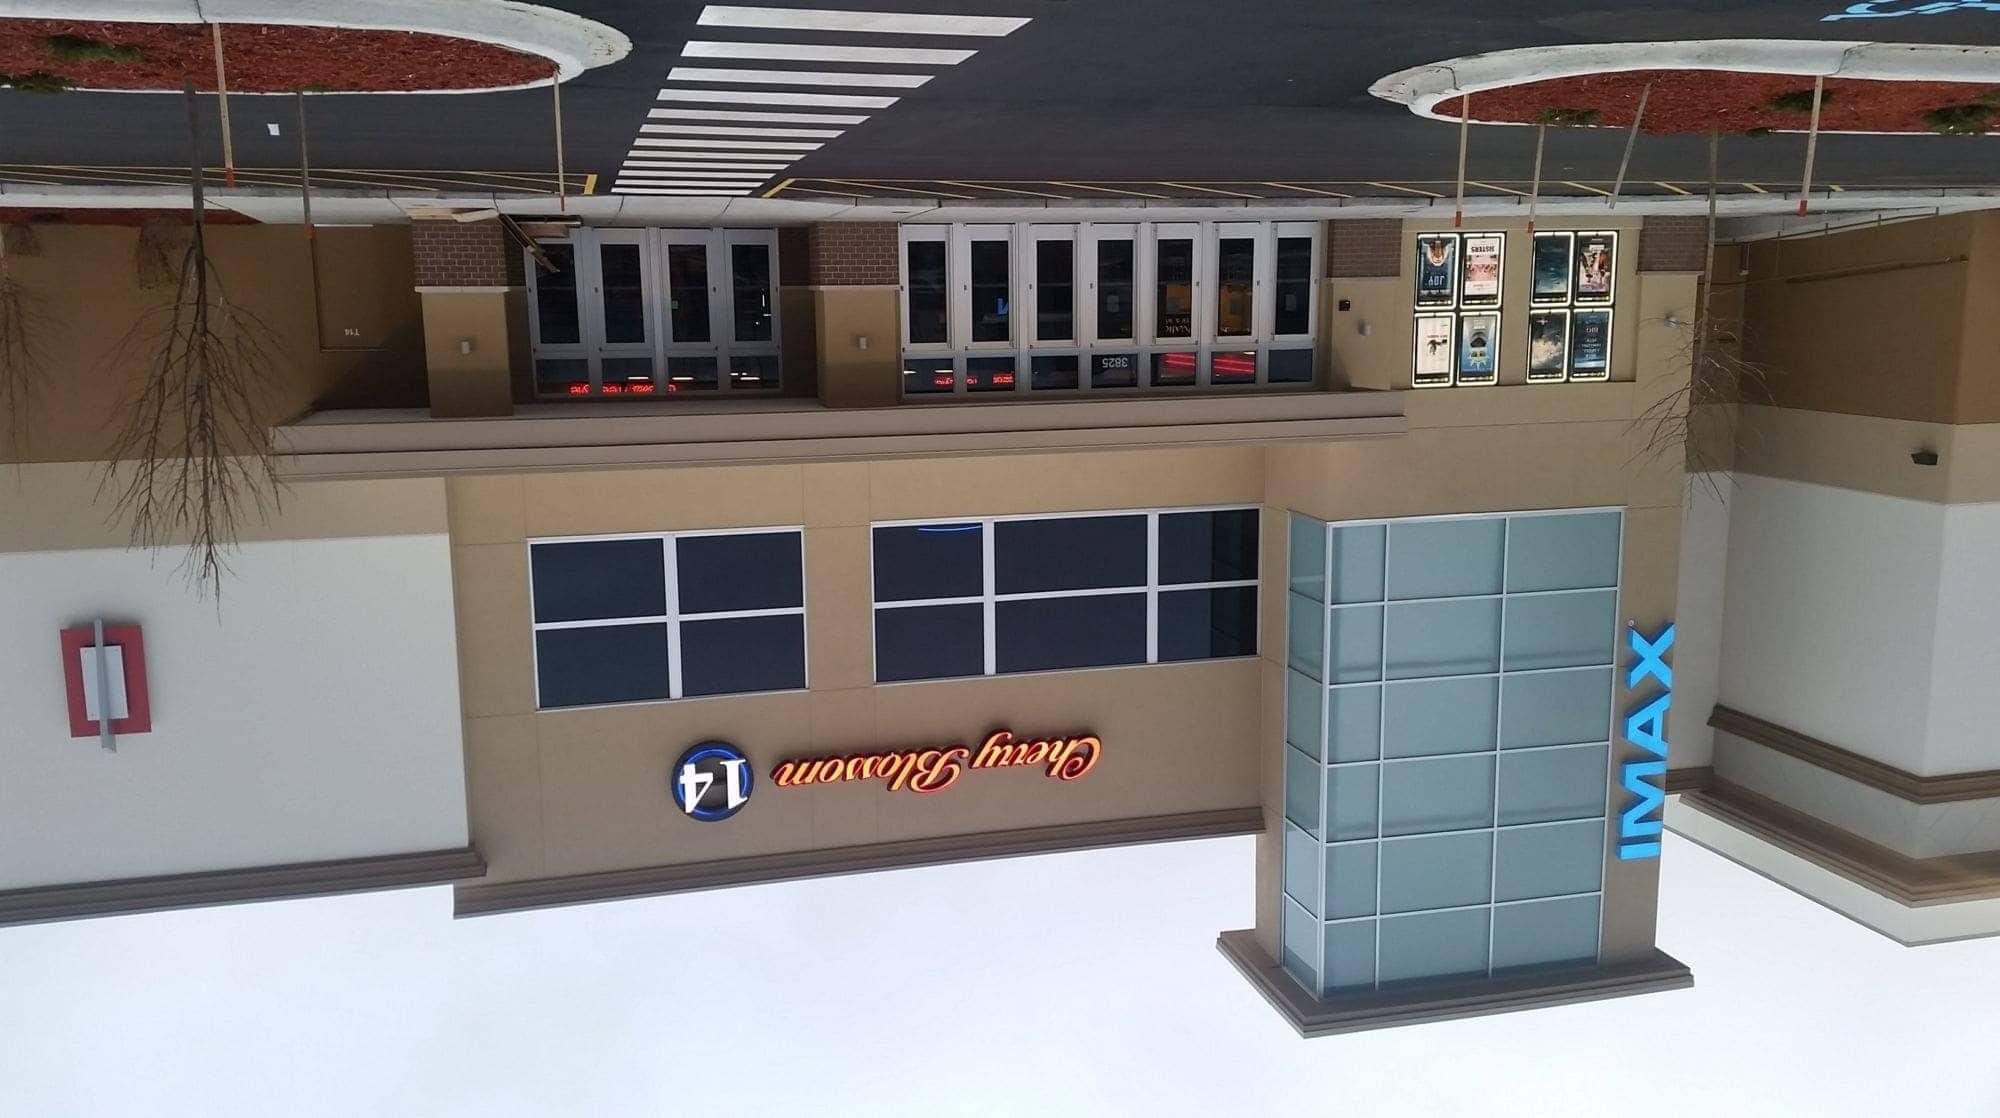 Traverse city movie theatres